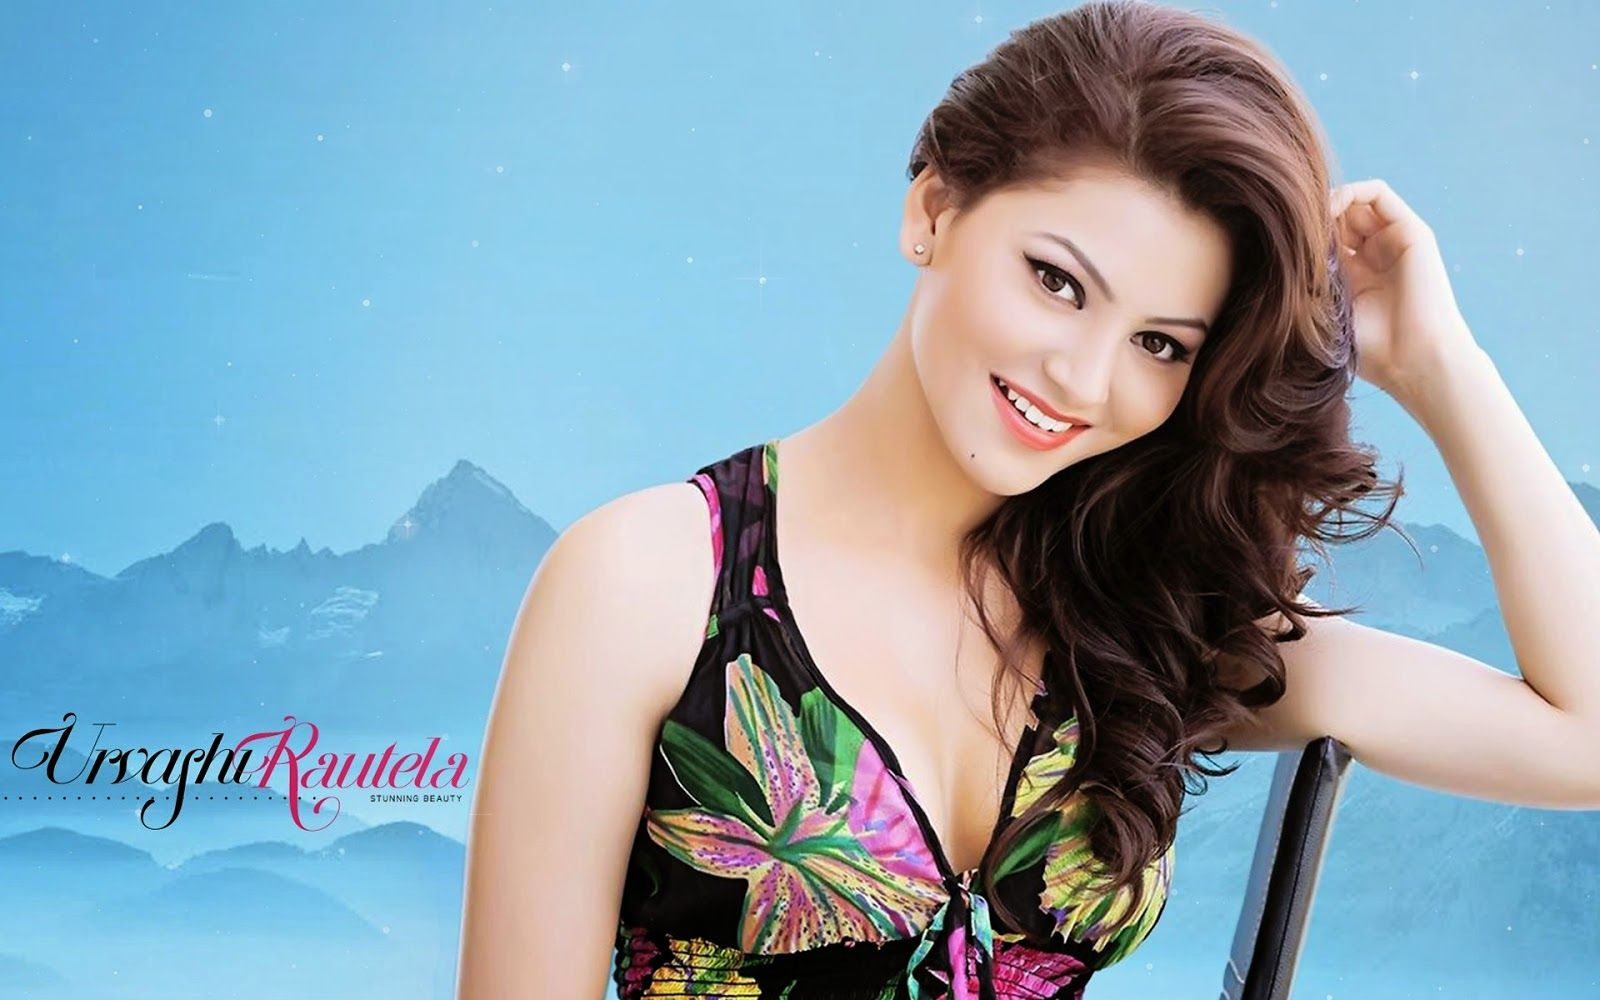 Hd wallpaper bollywood - Top Full Hd Bollywood Actress Wallpapers Hd Wallpapers Pop 1600 1000 Hot Hindi Actress Wallpapers